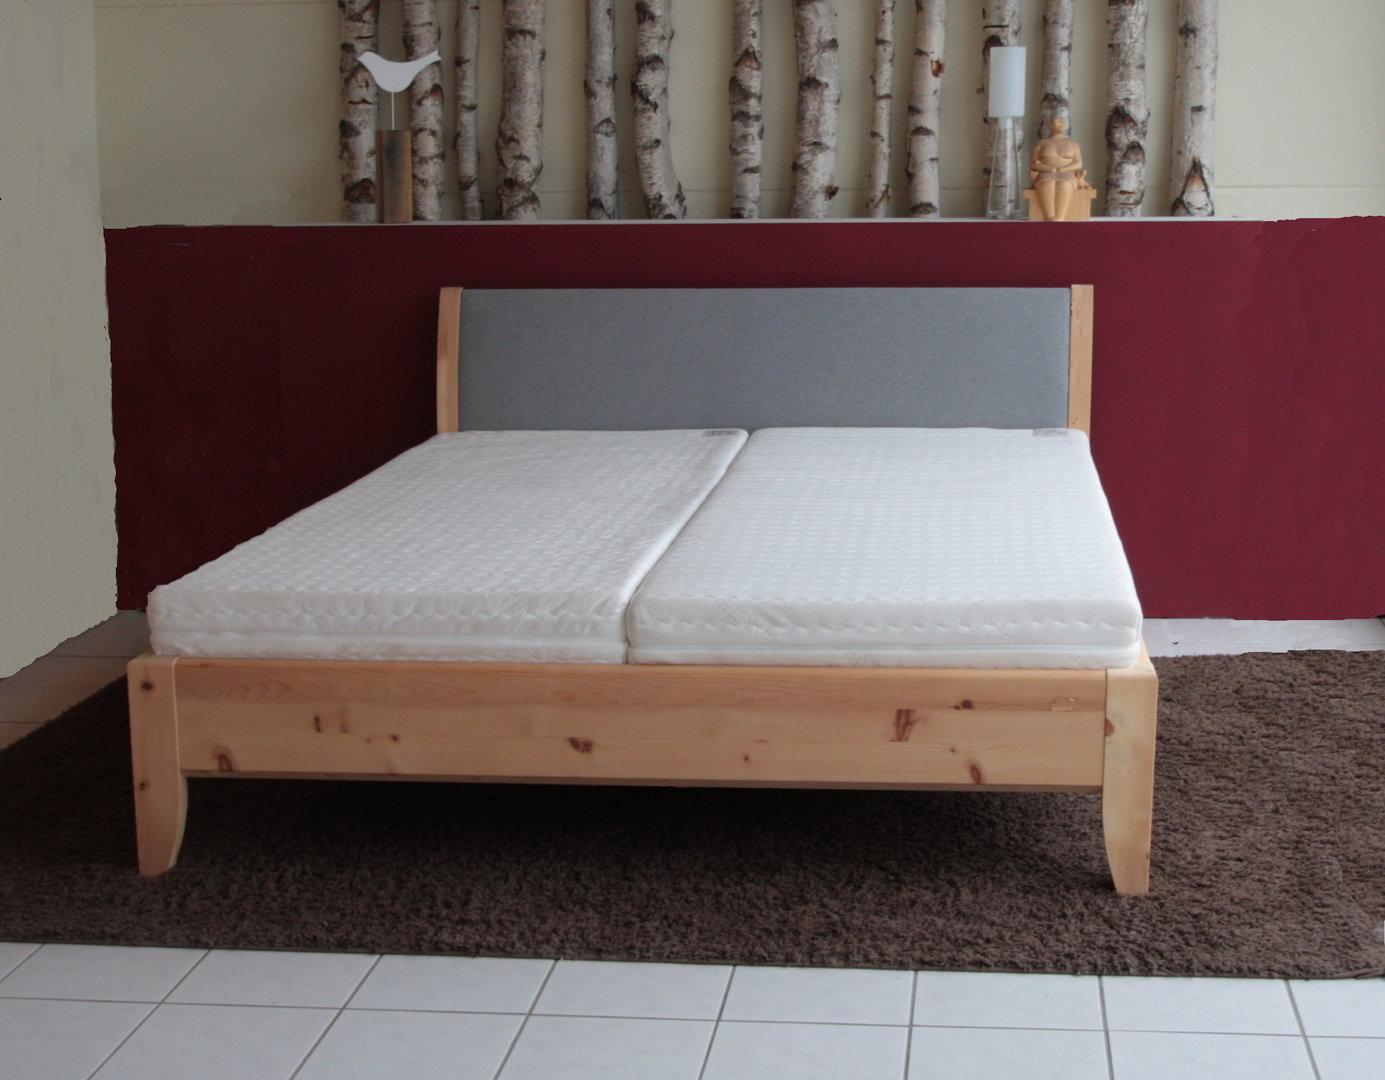 massivholzbett terra das bett mit dem charme des suedens. Black Bedroom Furniture Sets. Home Design Ideas